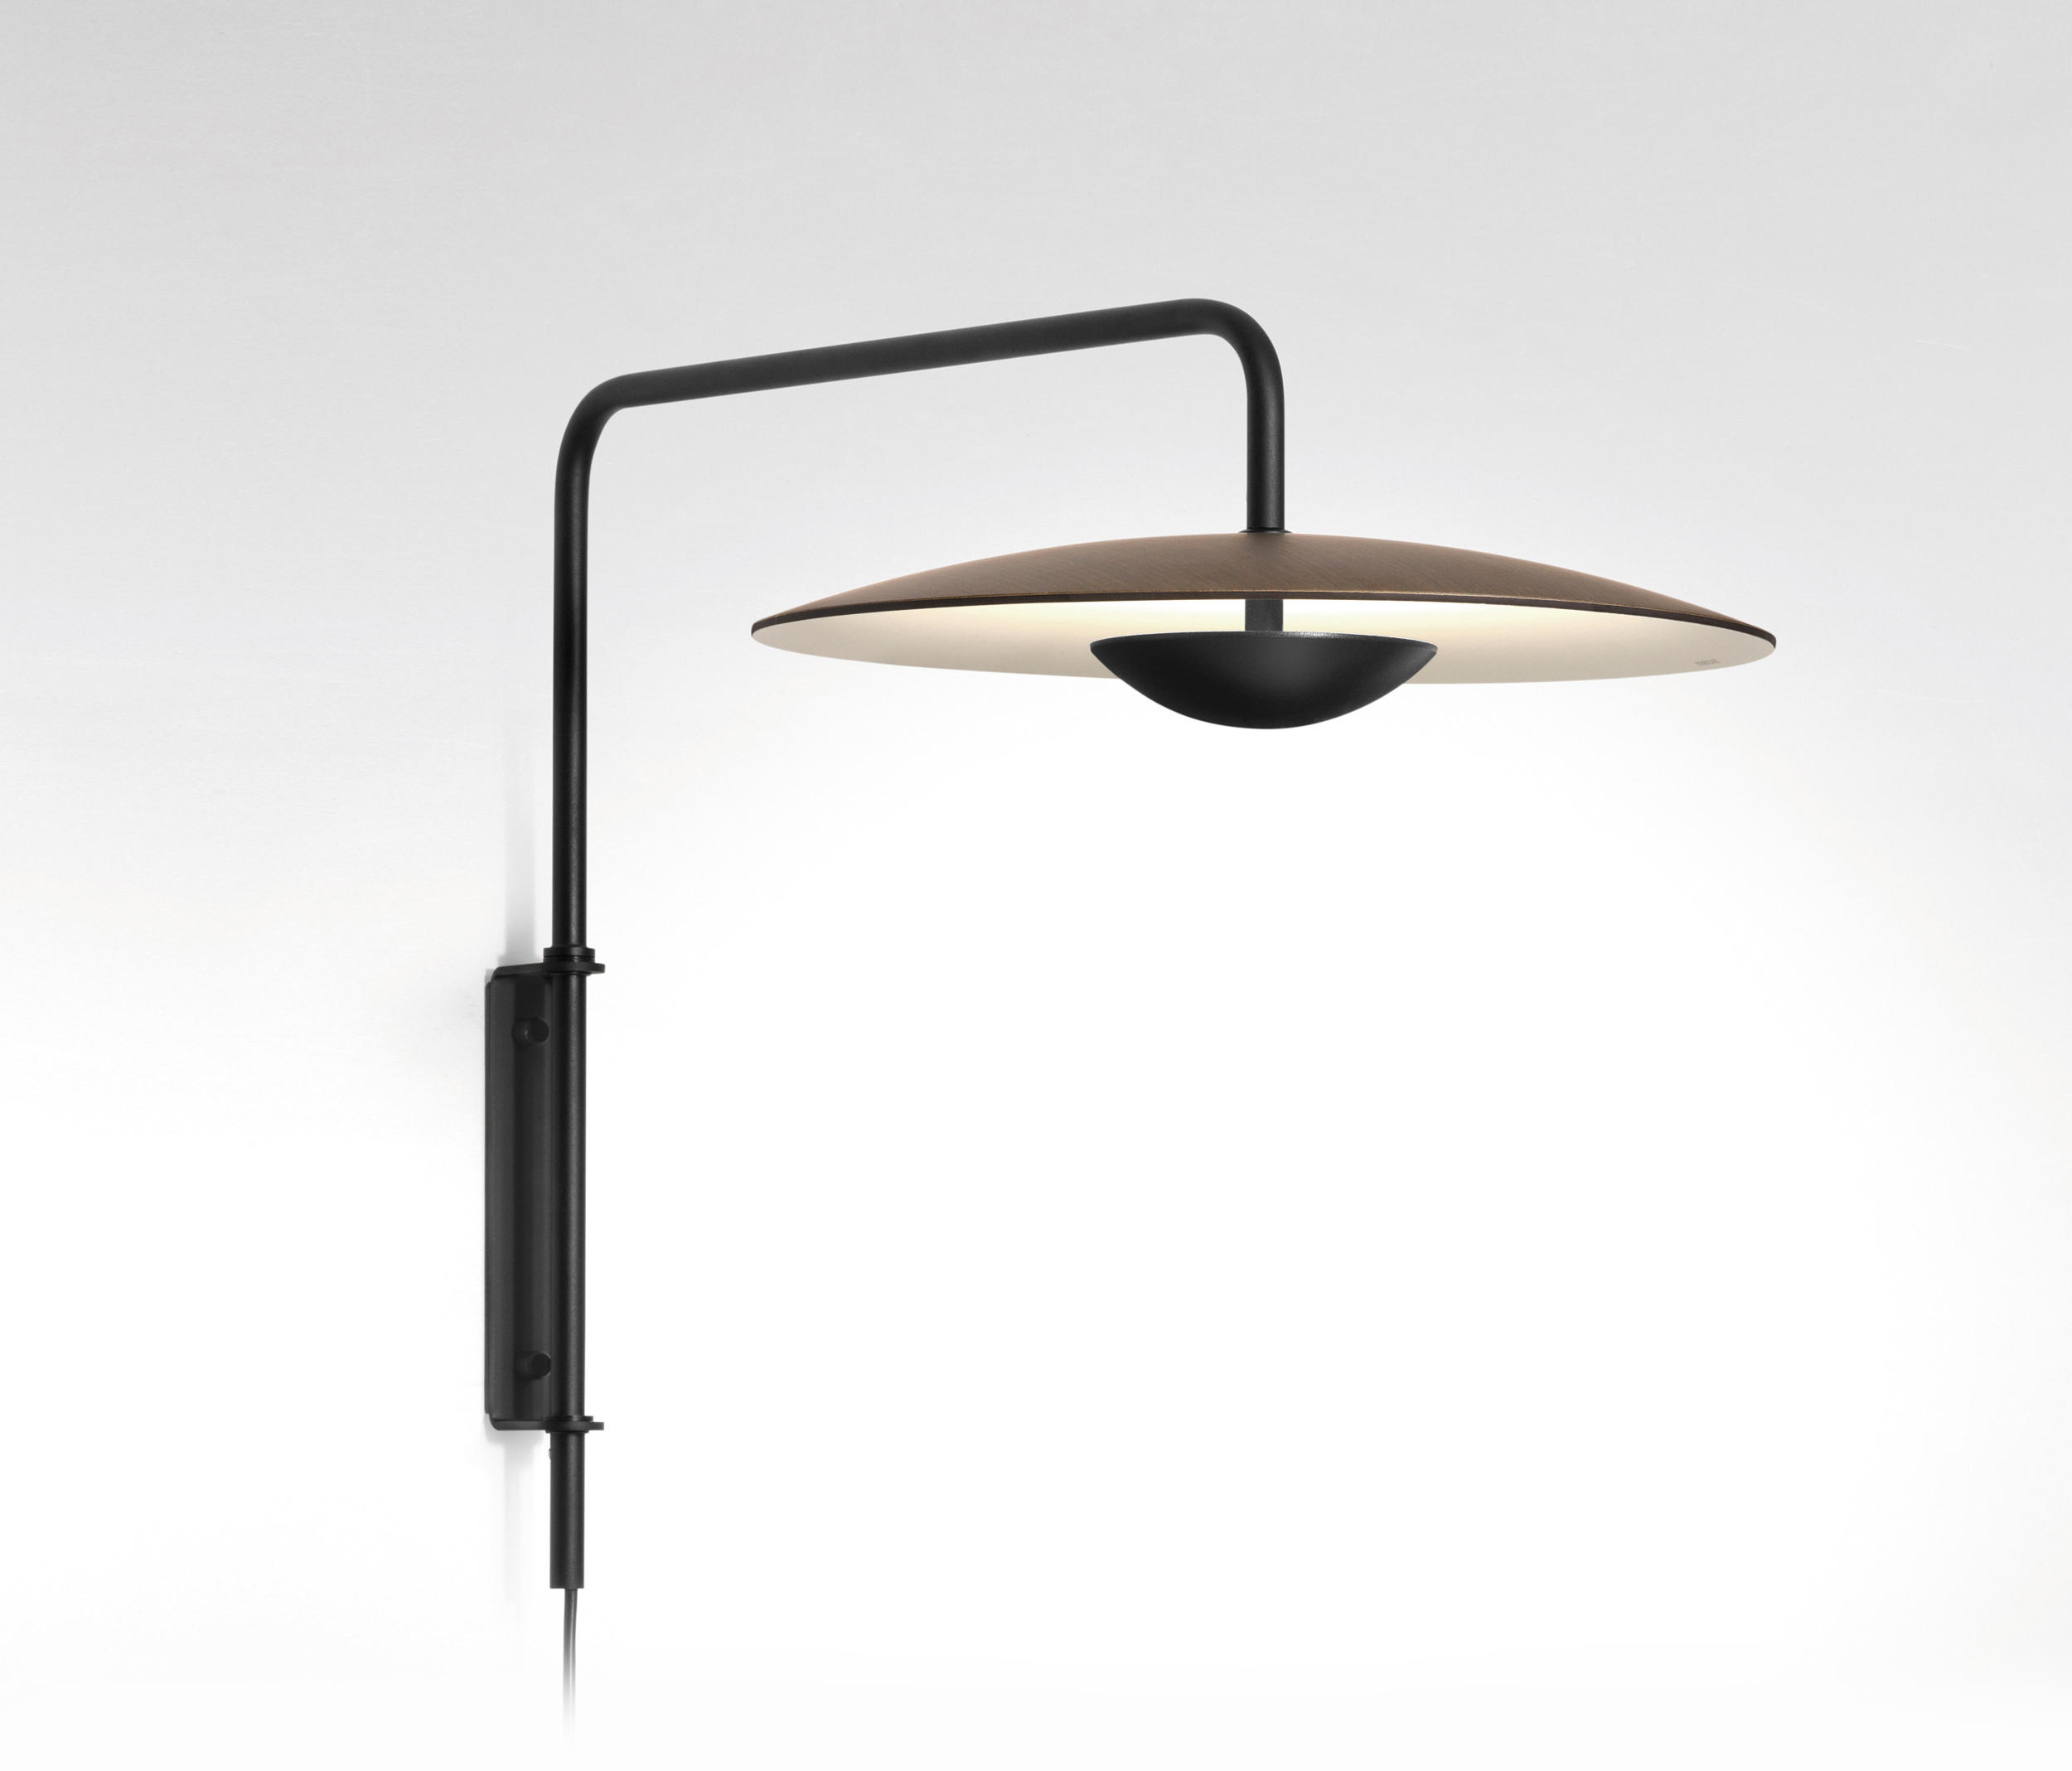 ginger a allgemeinbeleuchtung von marset architonic. Black Bedroom Furniture Sets. Home Design Ideas